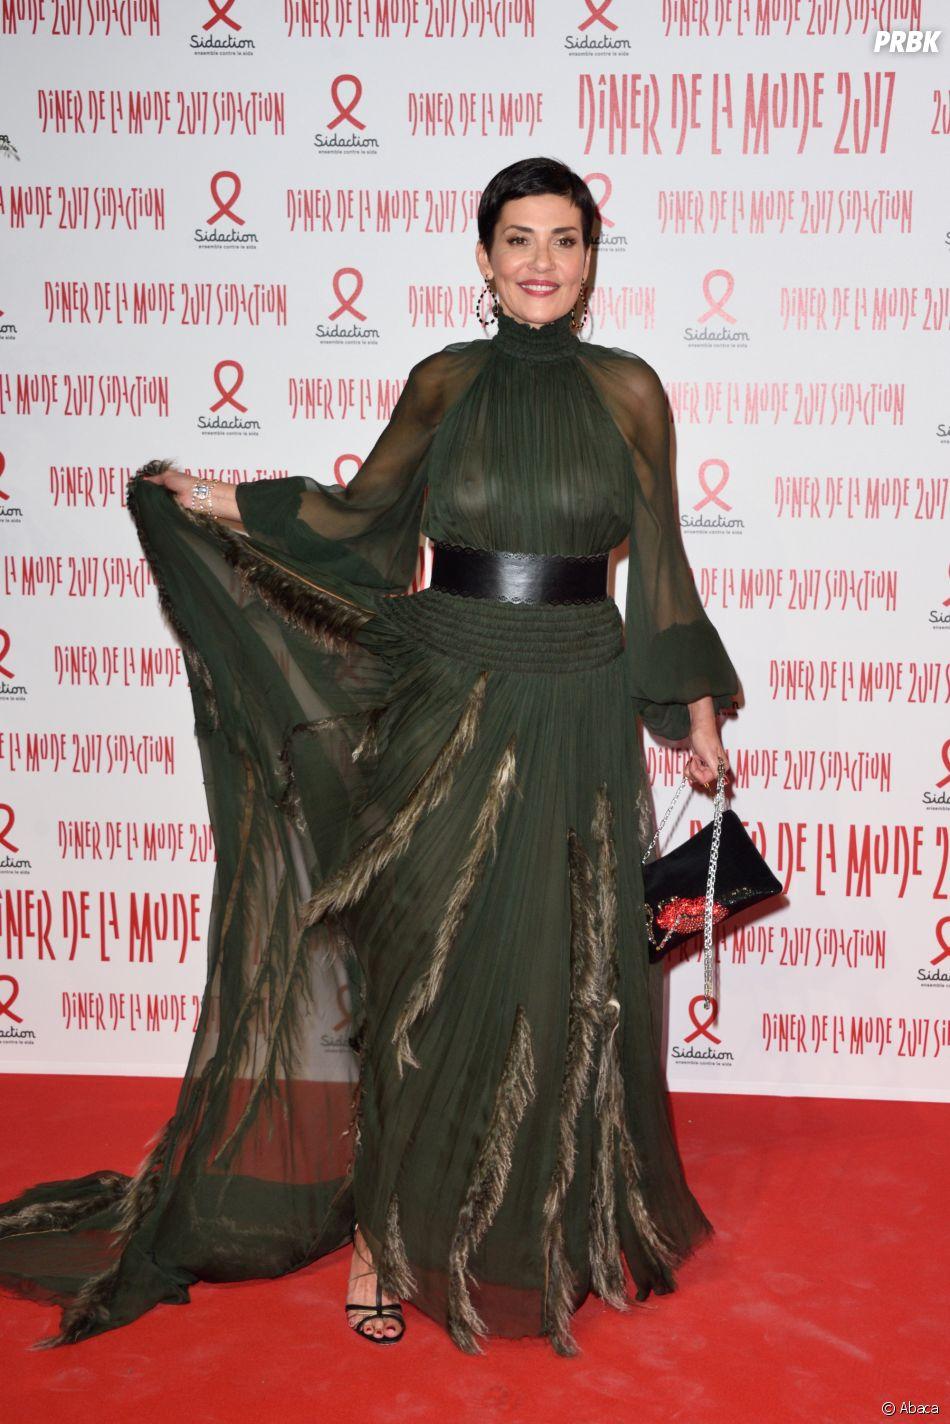 Cristina Cordula : oups, sa robe dévoile sa poitrine à Paris le 26 janvier 2017